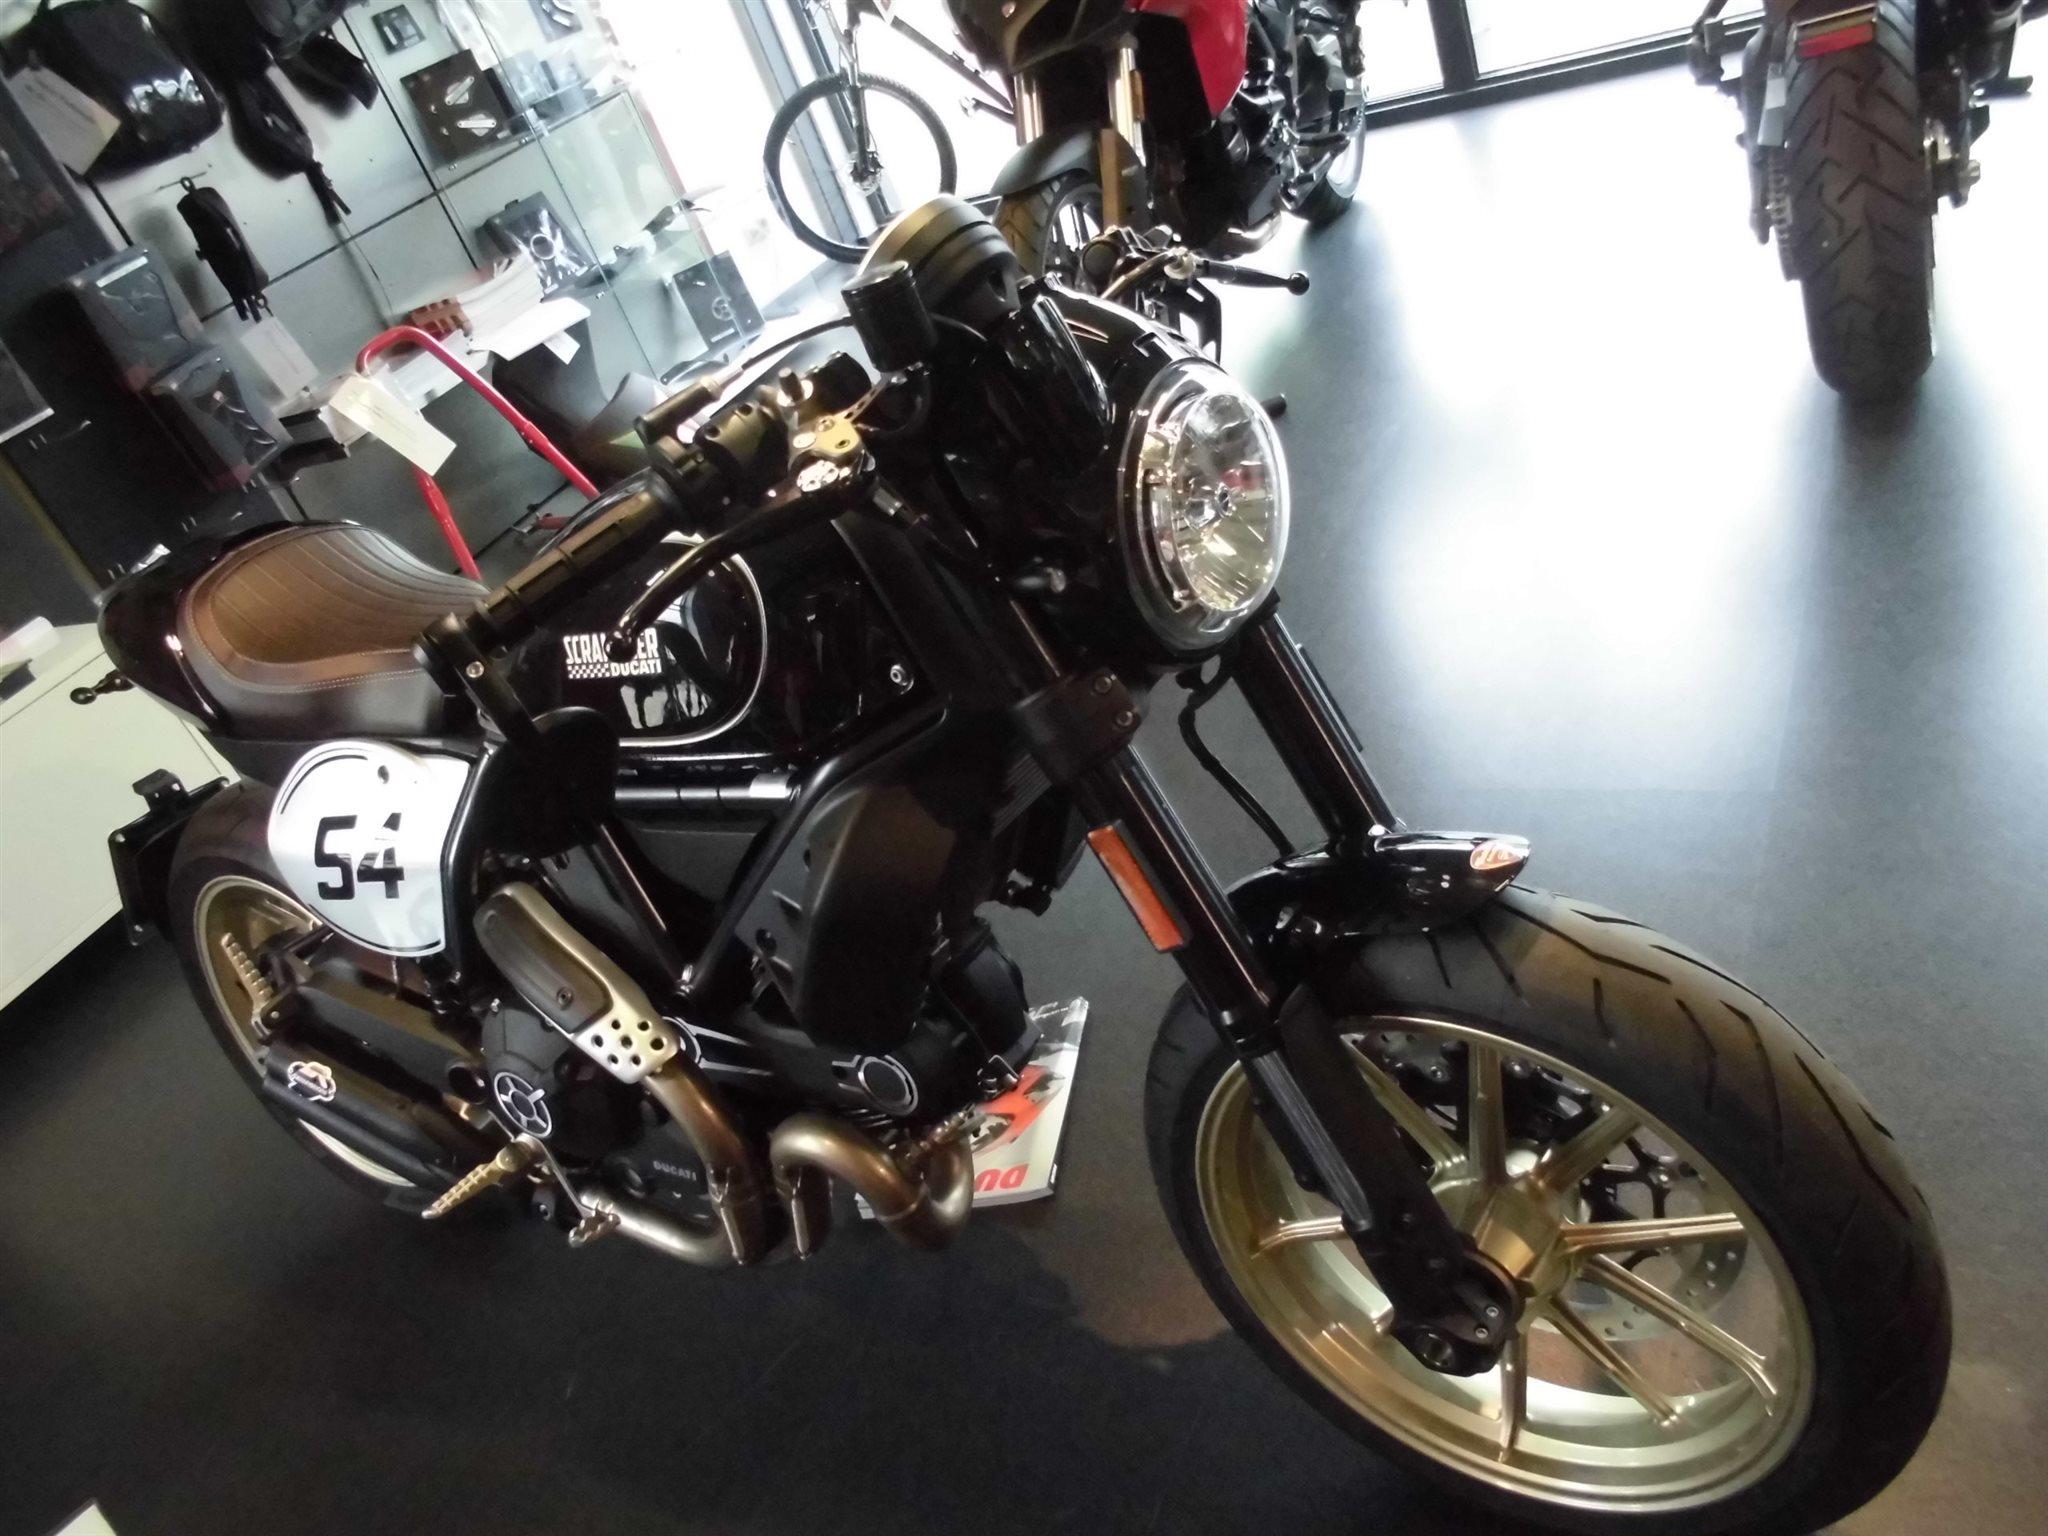 umgebautes motorrad ducati scrambler cafe racer von team. Black Bedroom Furniture Sets. Home Design Ideas